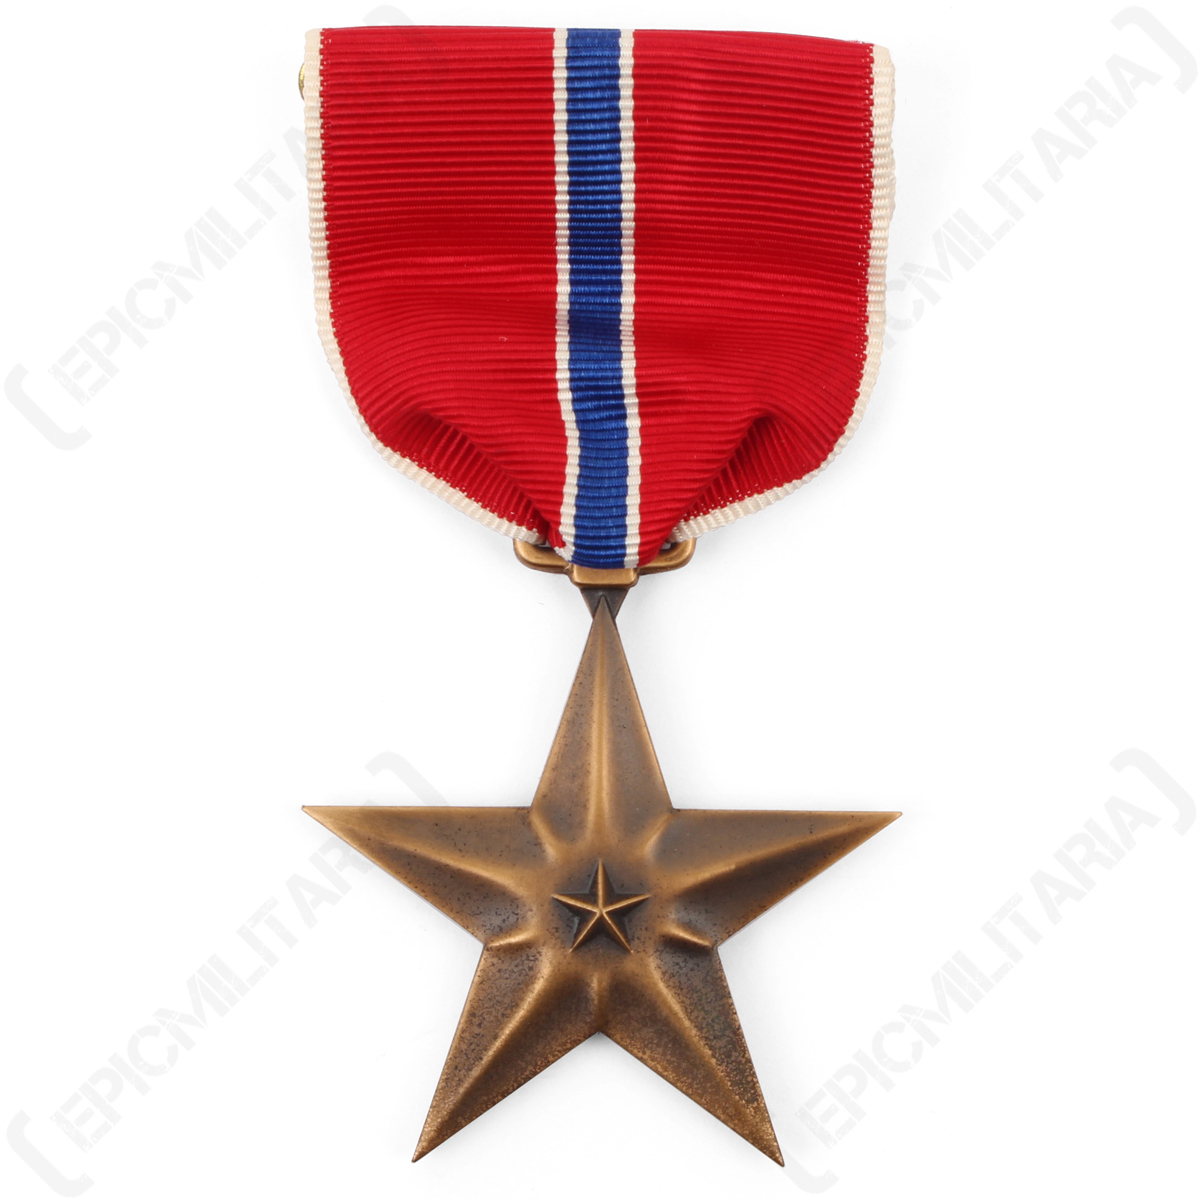 US Unit and Award Badges